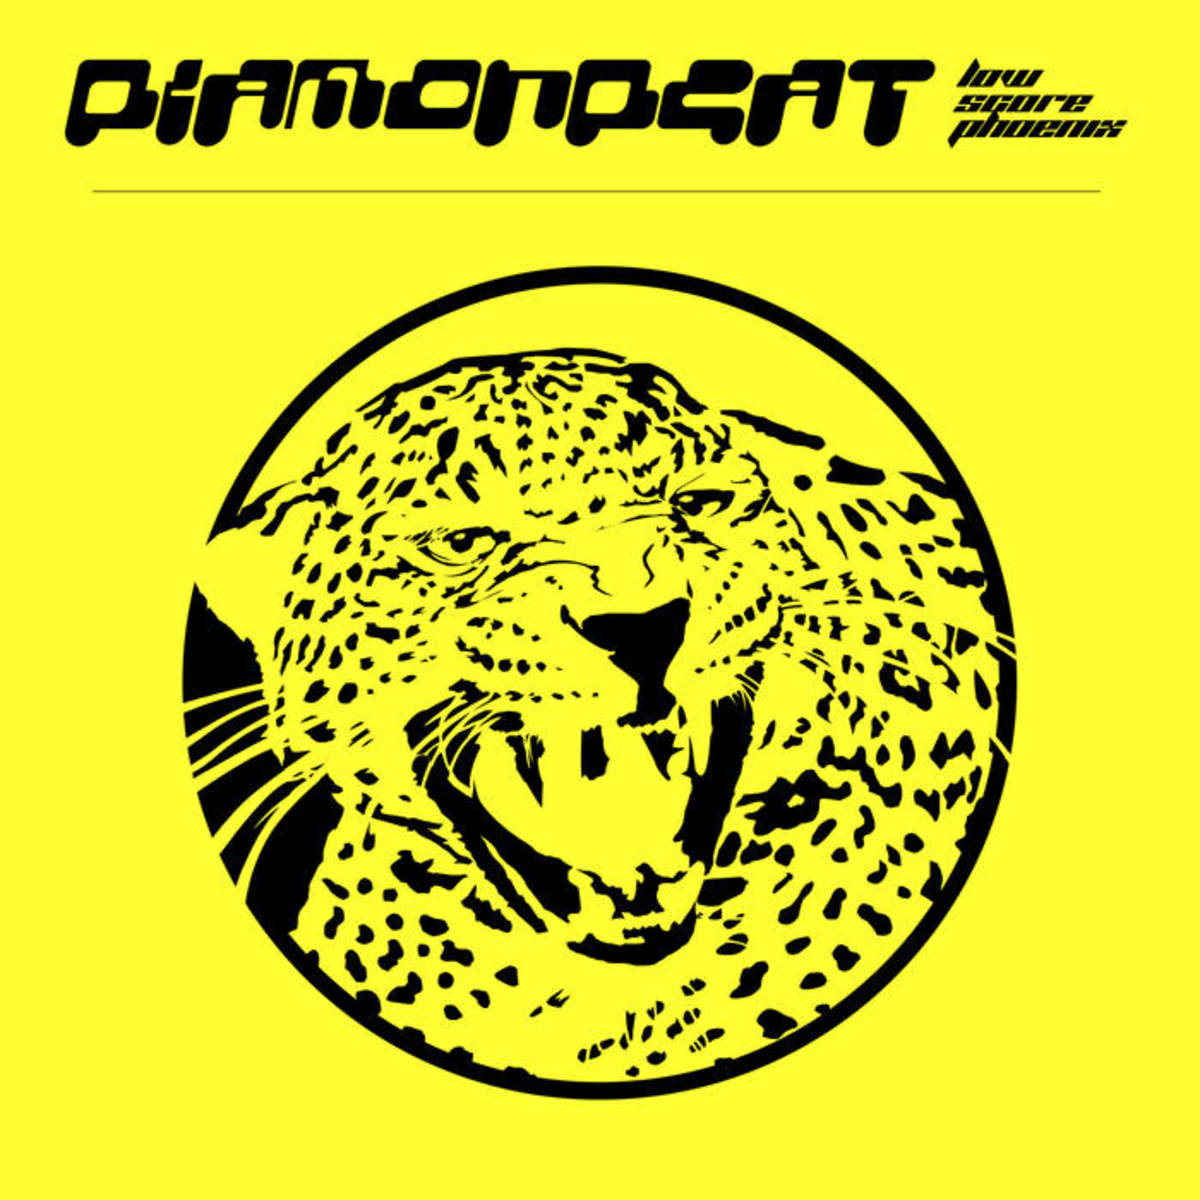 synth-ep-review-low-score-phoenix-by-diamondcat